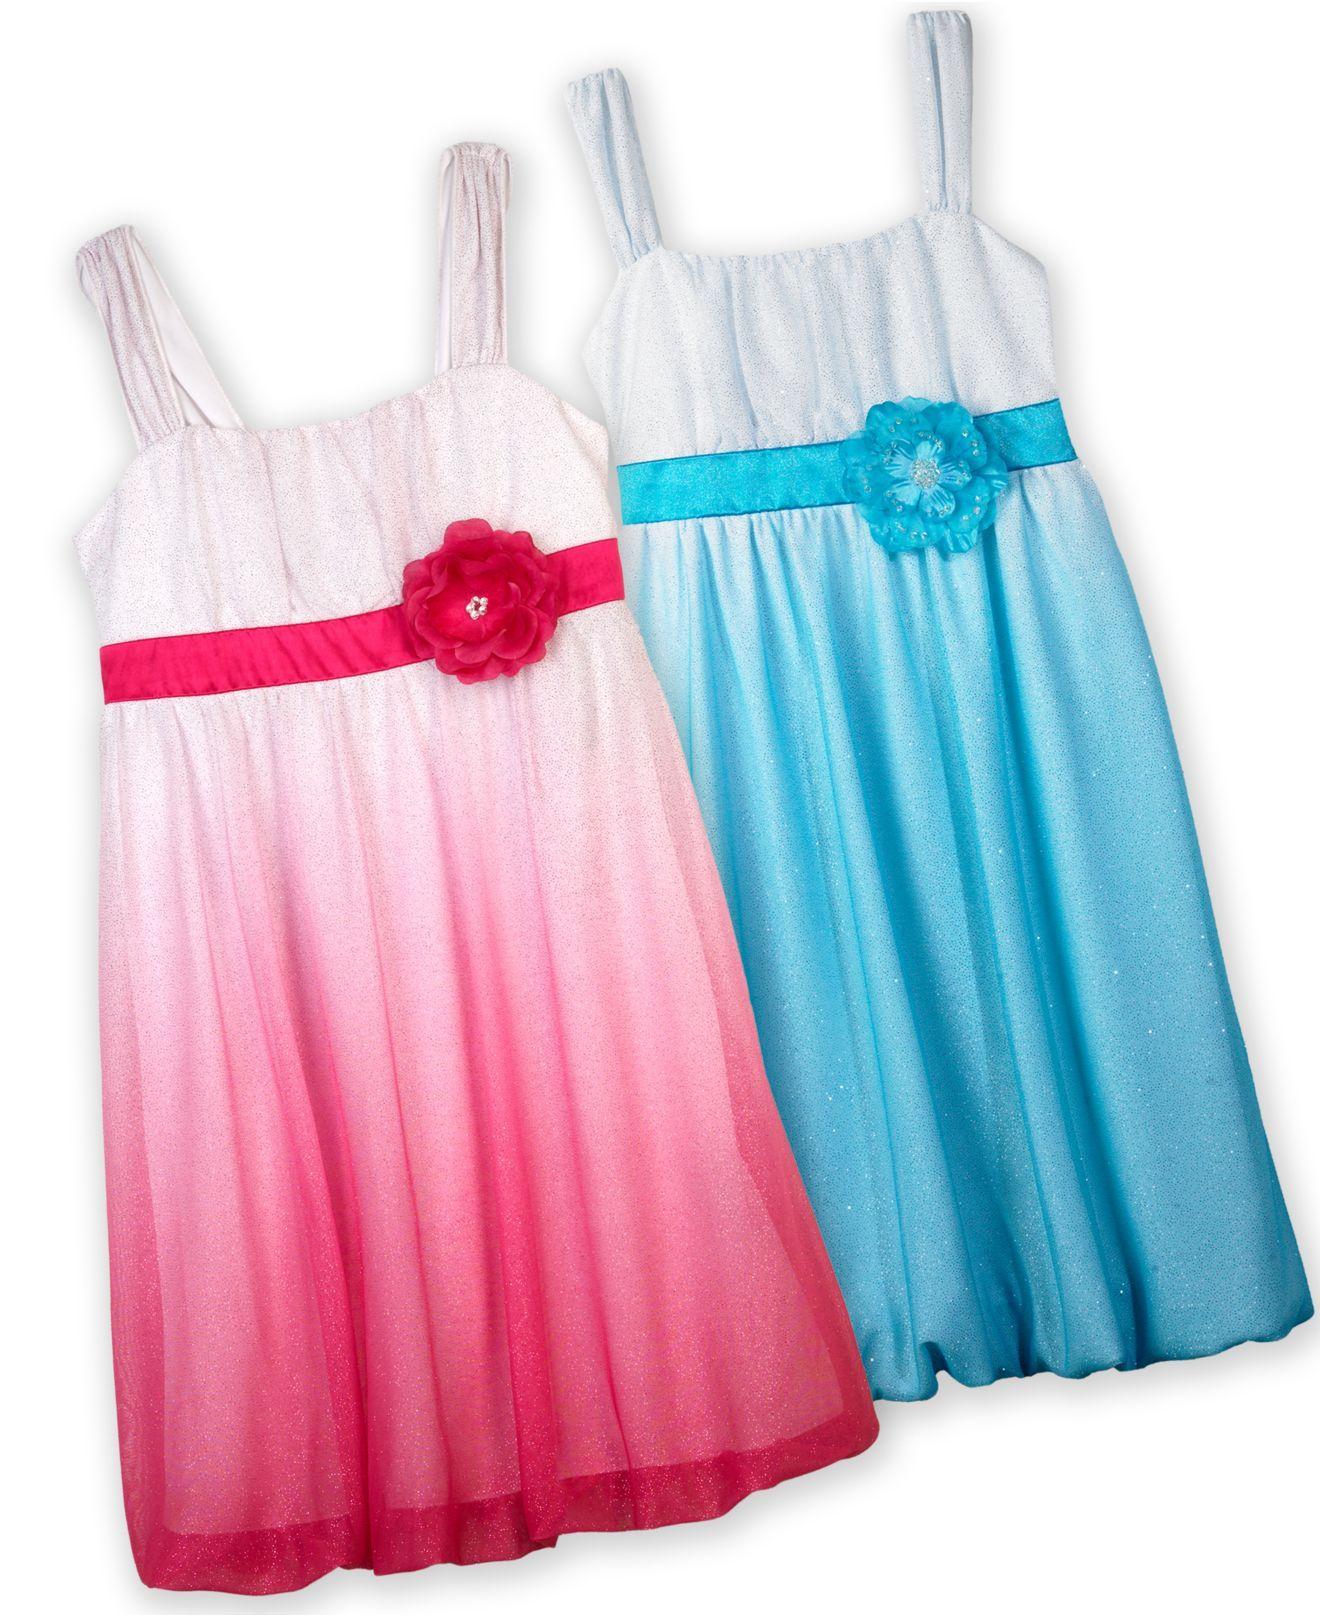 BCX Kids Dress, Girls Ombre Glitter Dress - Kids Dresses - Macy's ...